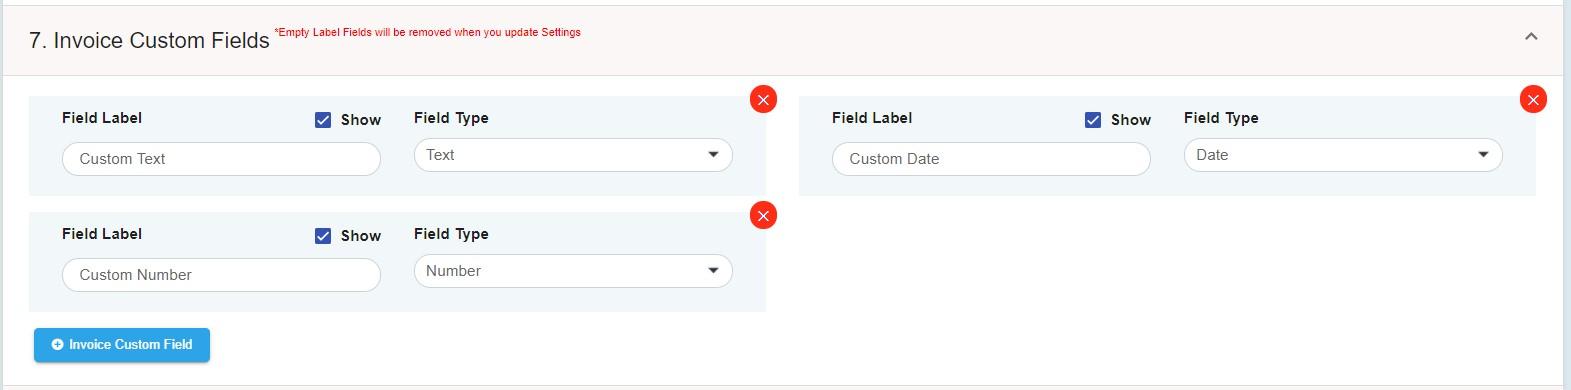 invoice-custom-fields